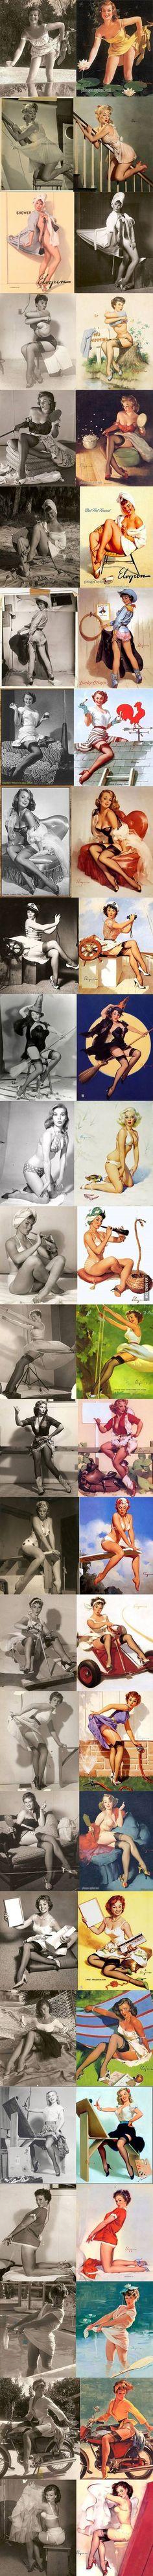 When there was no Photoshop... - 9GAG as mulheres  maralindas  deixaram saudades....sensualidade sem #tecnologia